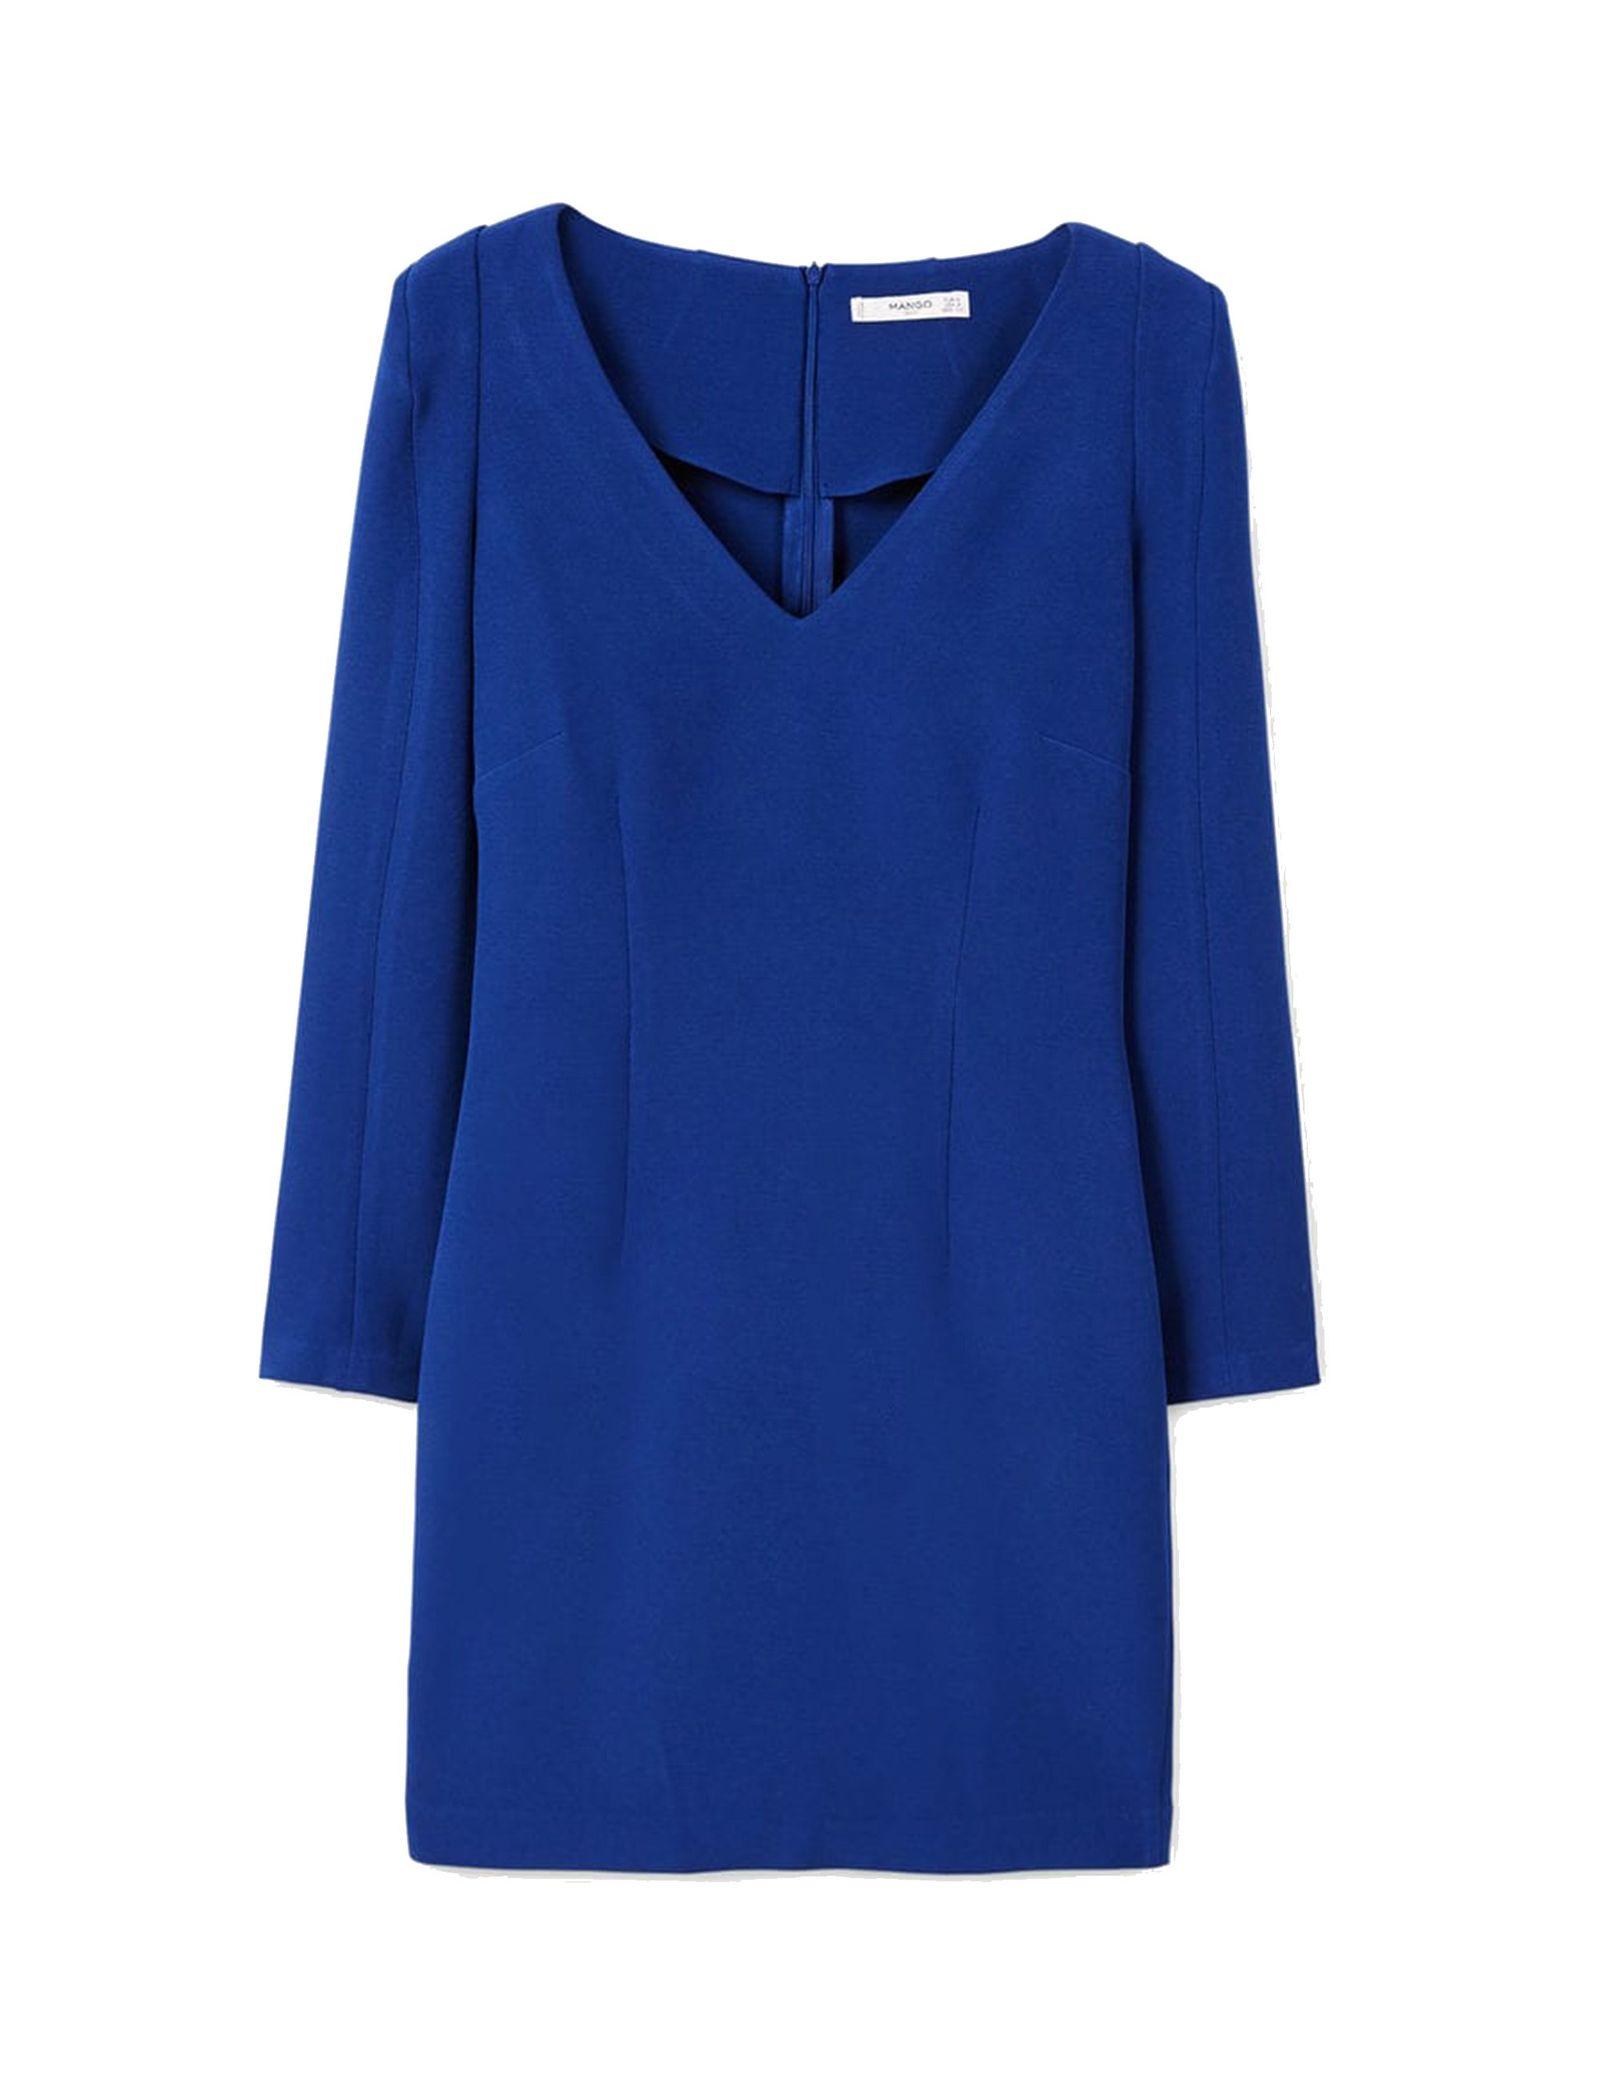 Woman Mini Dress - مانگو - آبي - 1